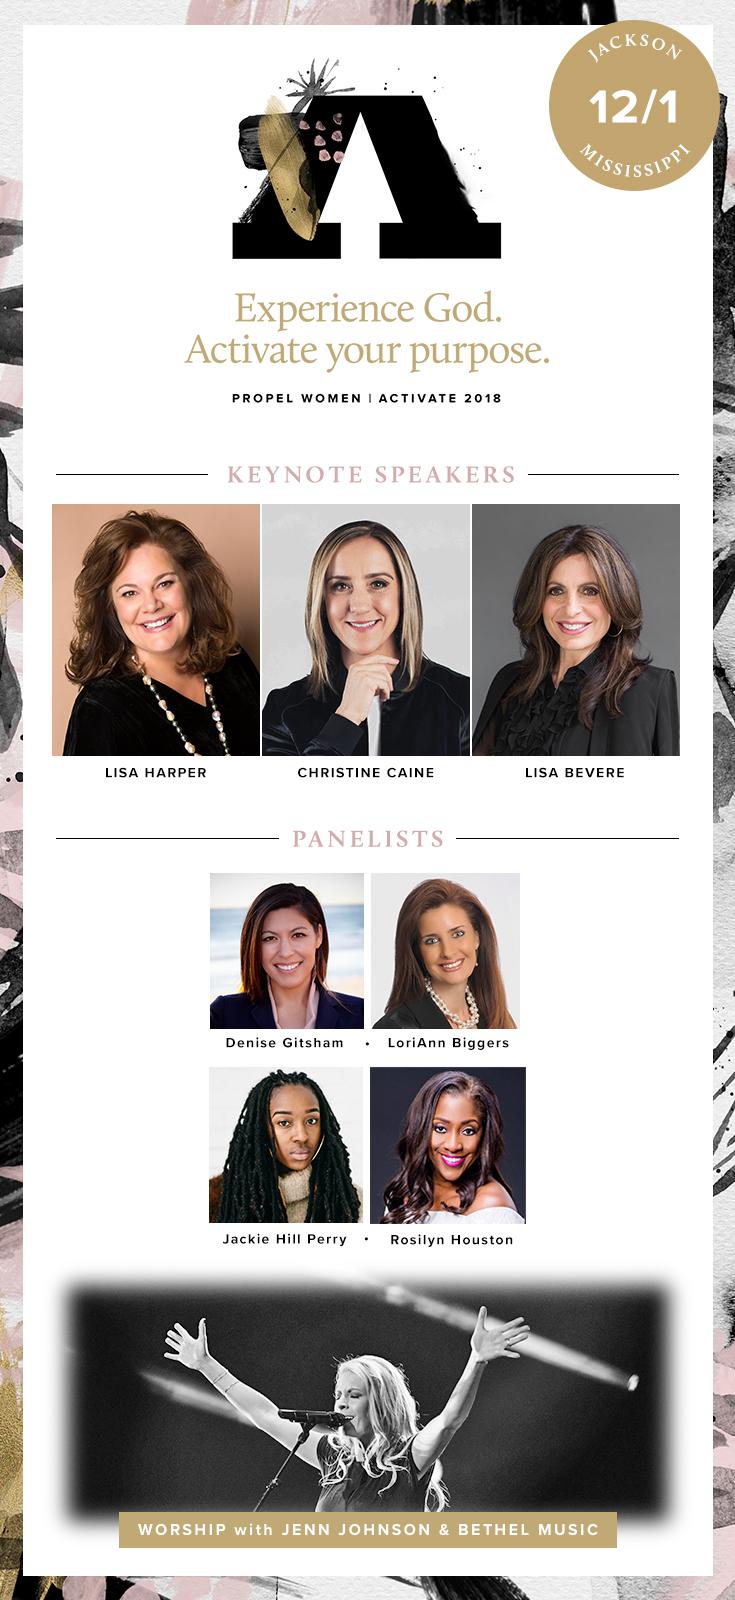 Jackson, MS Propel Women Activate 2018